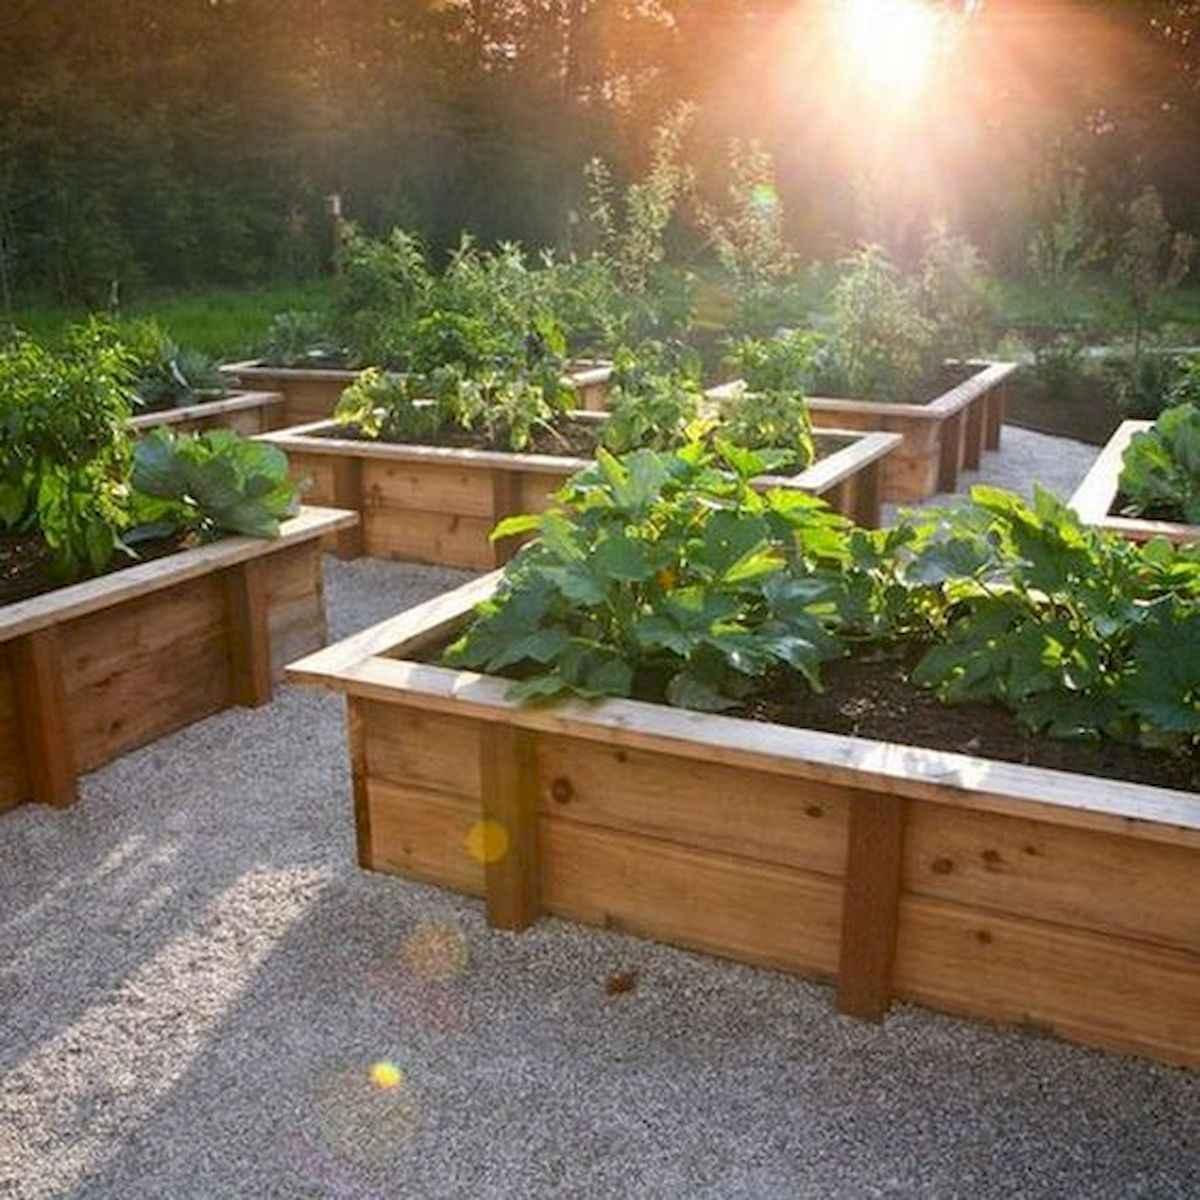 55 Favorite Garden Boxes Raised Design Ideas (51)